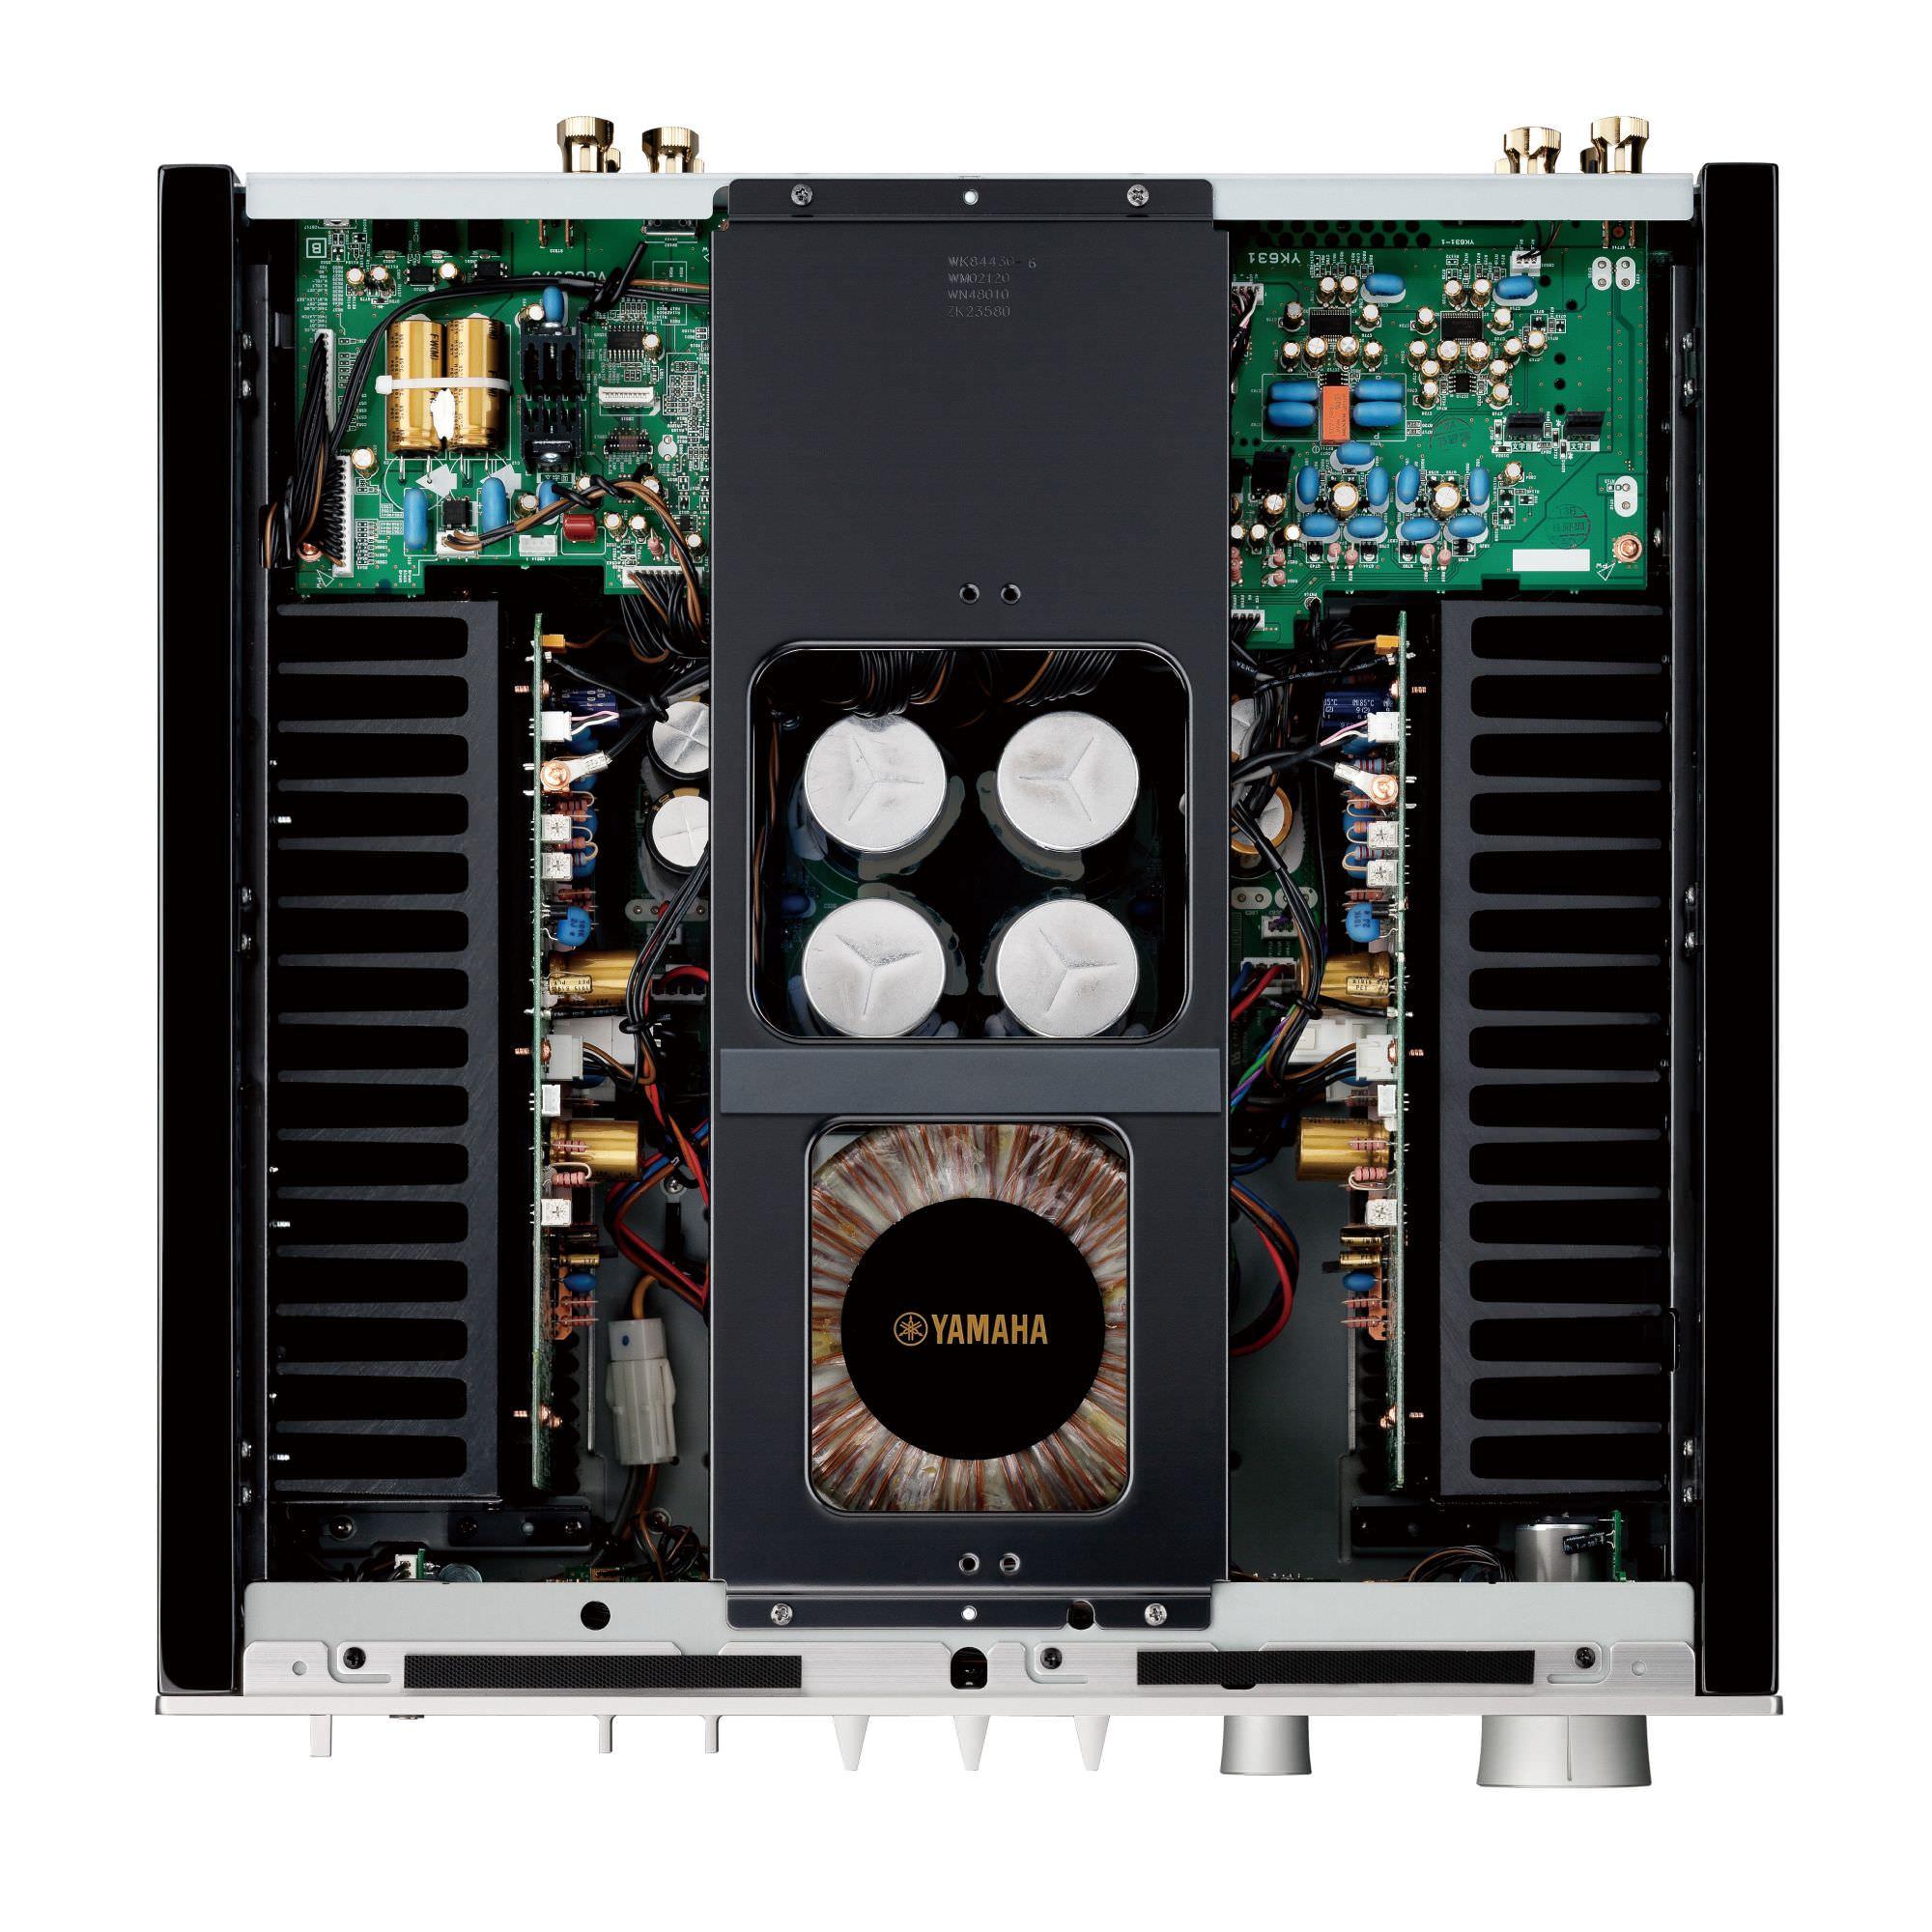 Yamaha A-S1200 Integrated Amplifier Interior